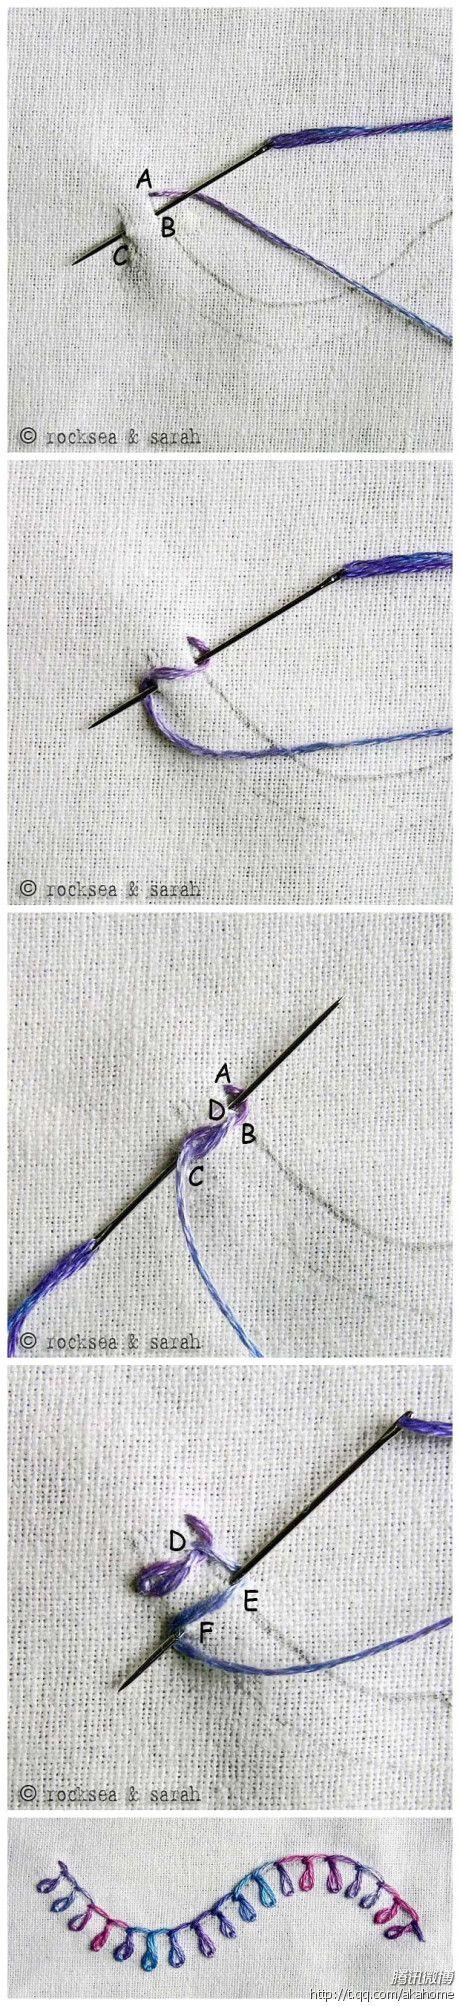 a must learn stitch